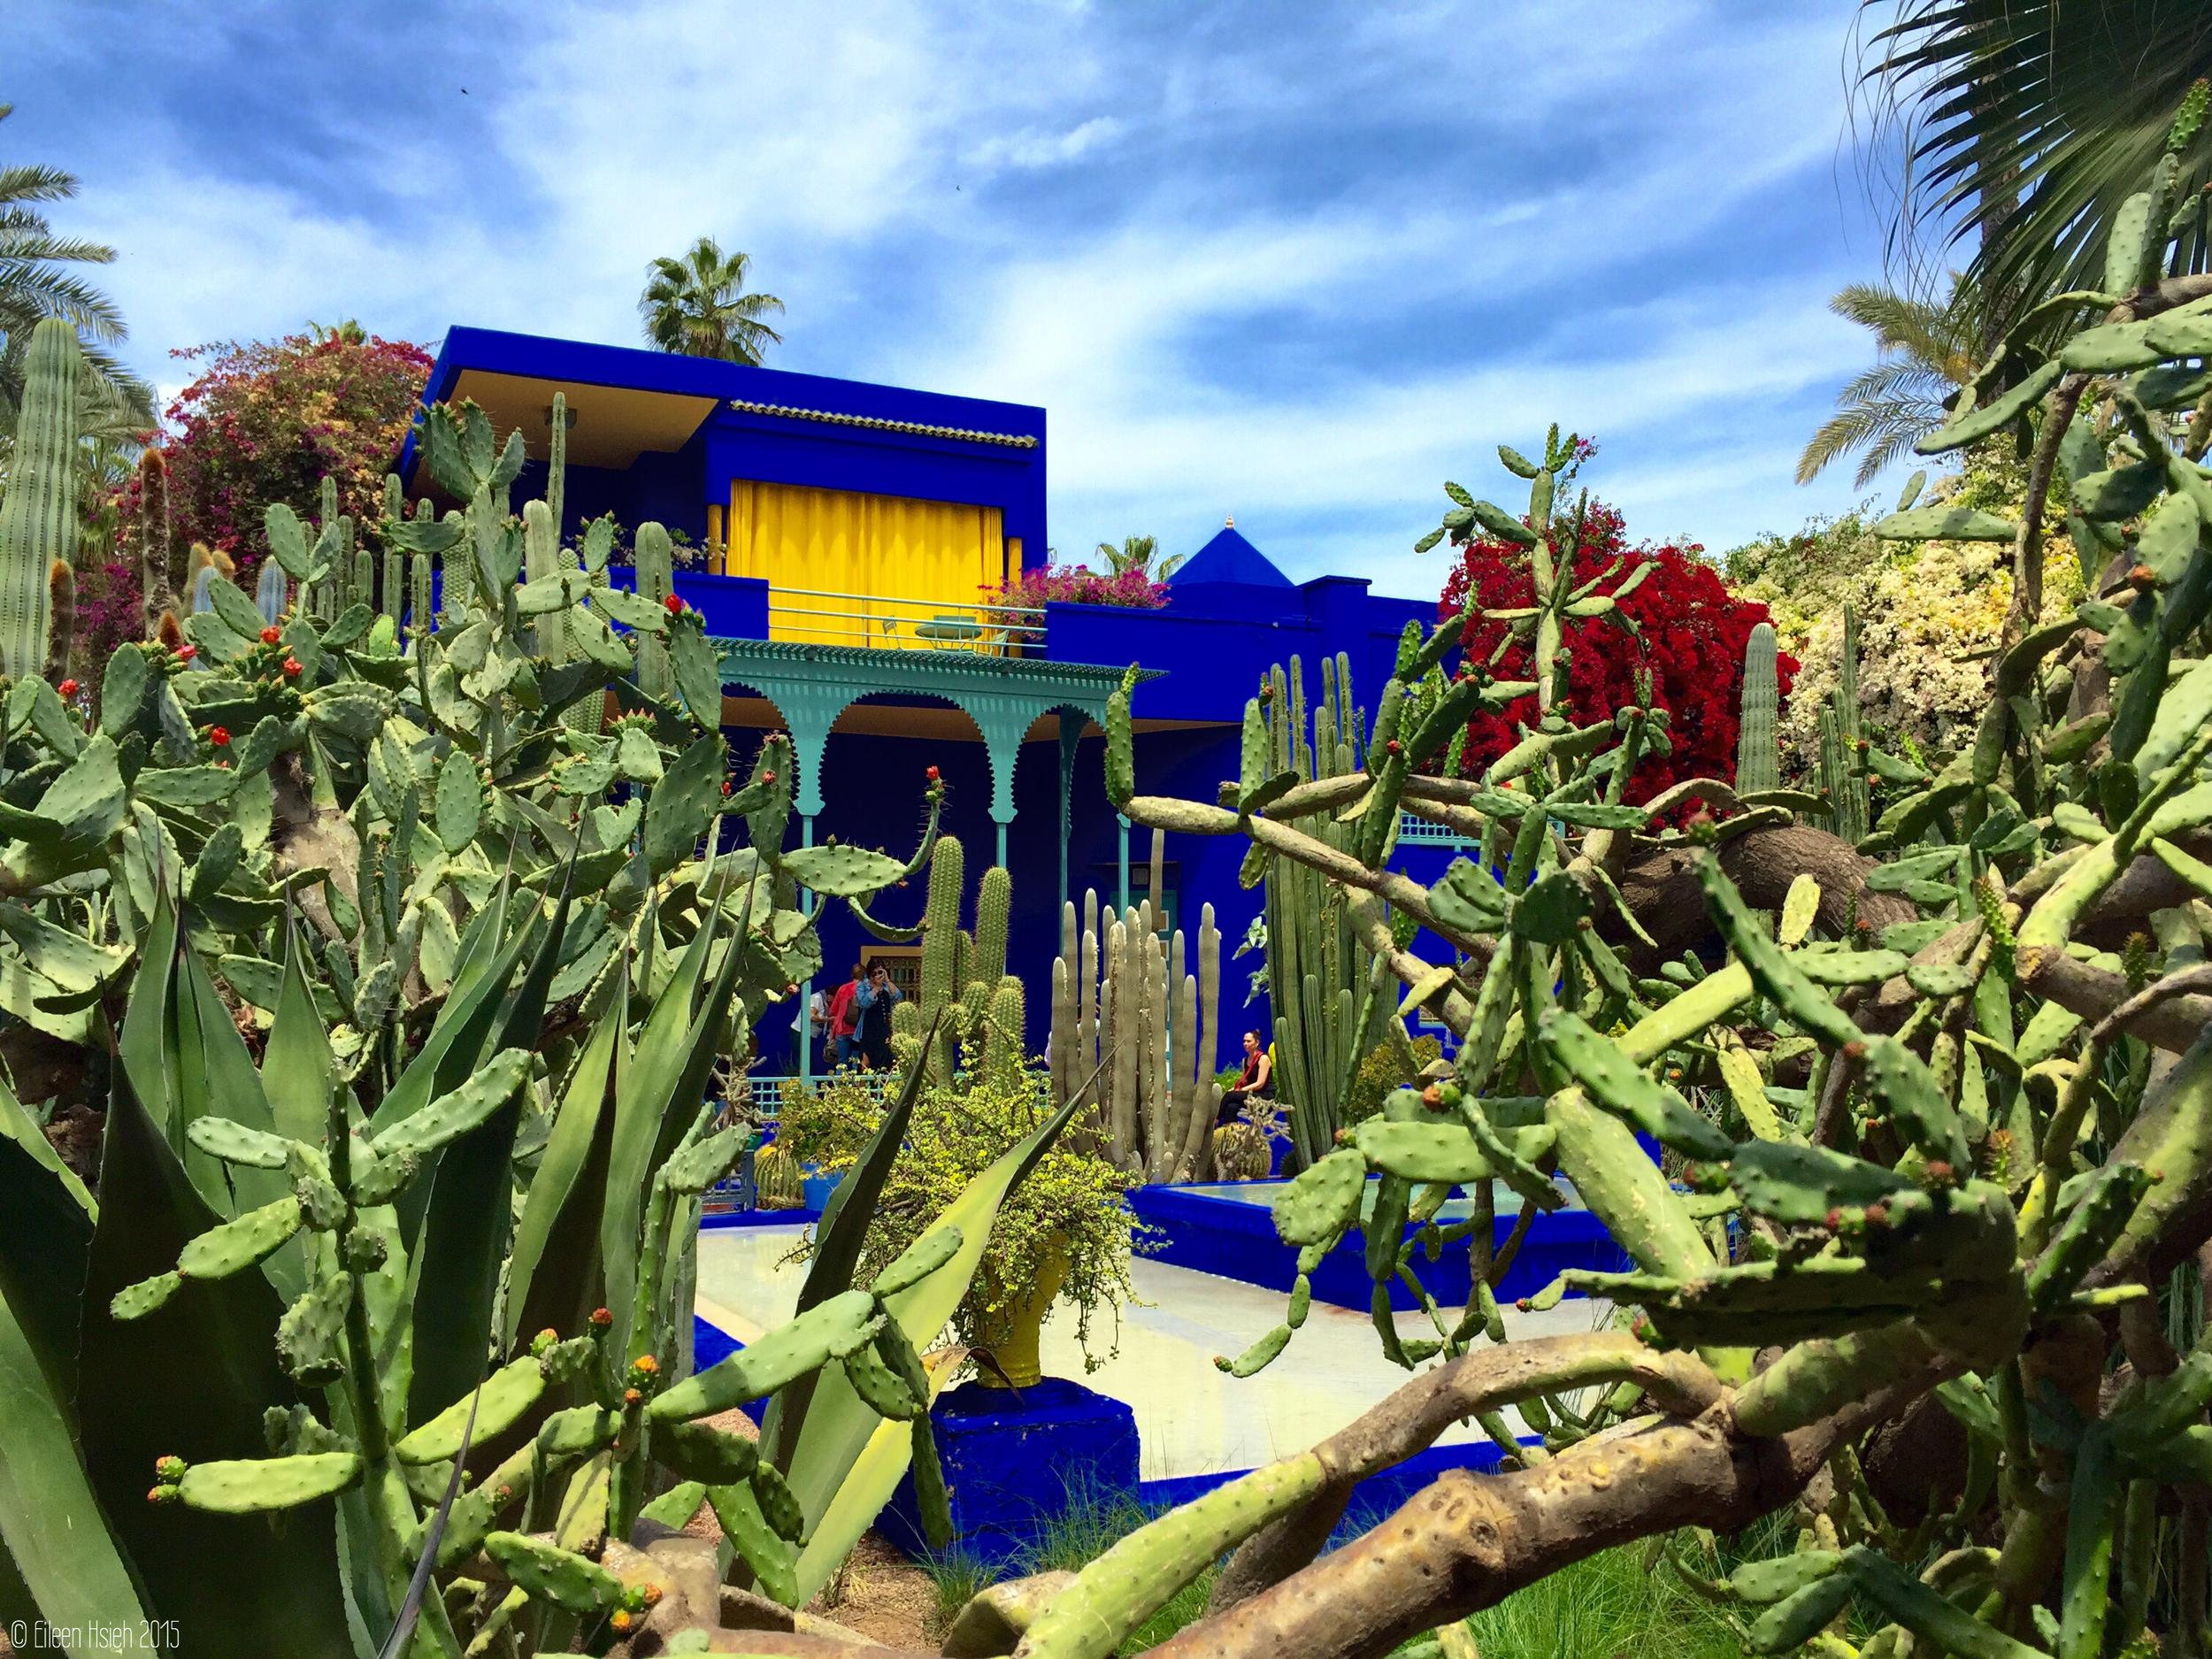 An oasis outside of the maddening medina,Jardin Majorelle is a top tourist attraction in Marrakech.Jardin Majorelle 馬若雷爾花園是城市裡的綠洲,也是旅客的最愛。